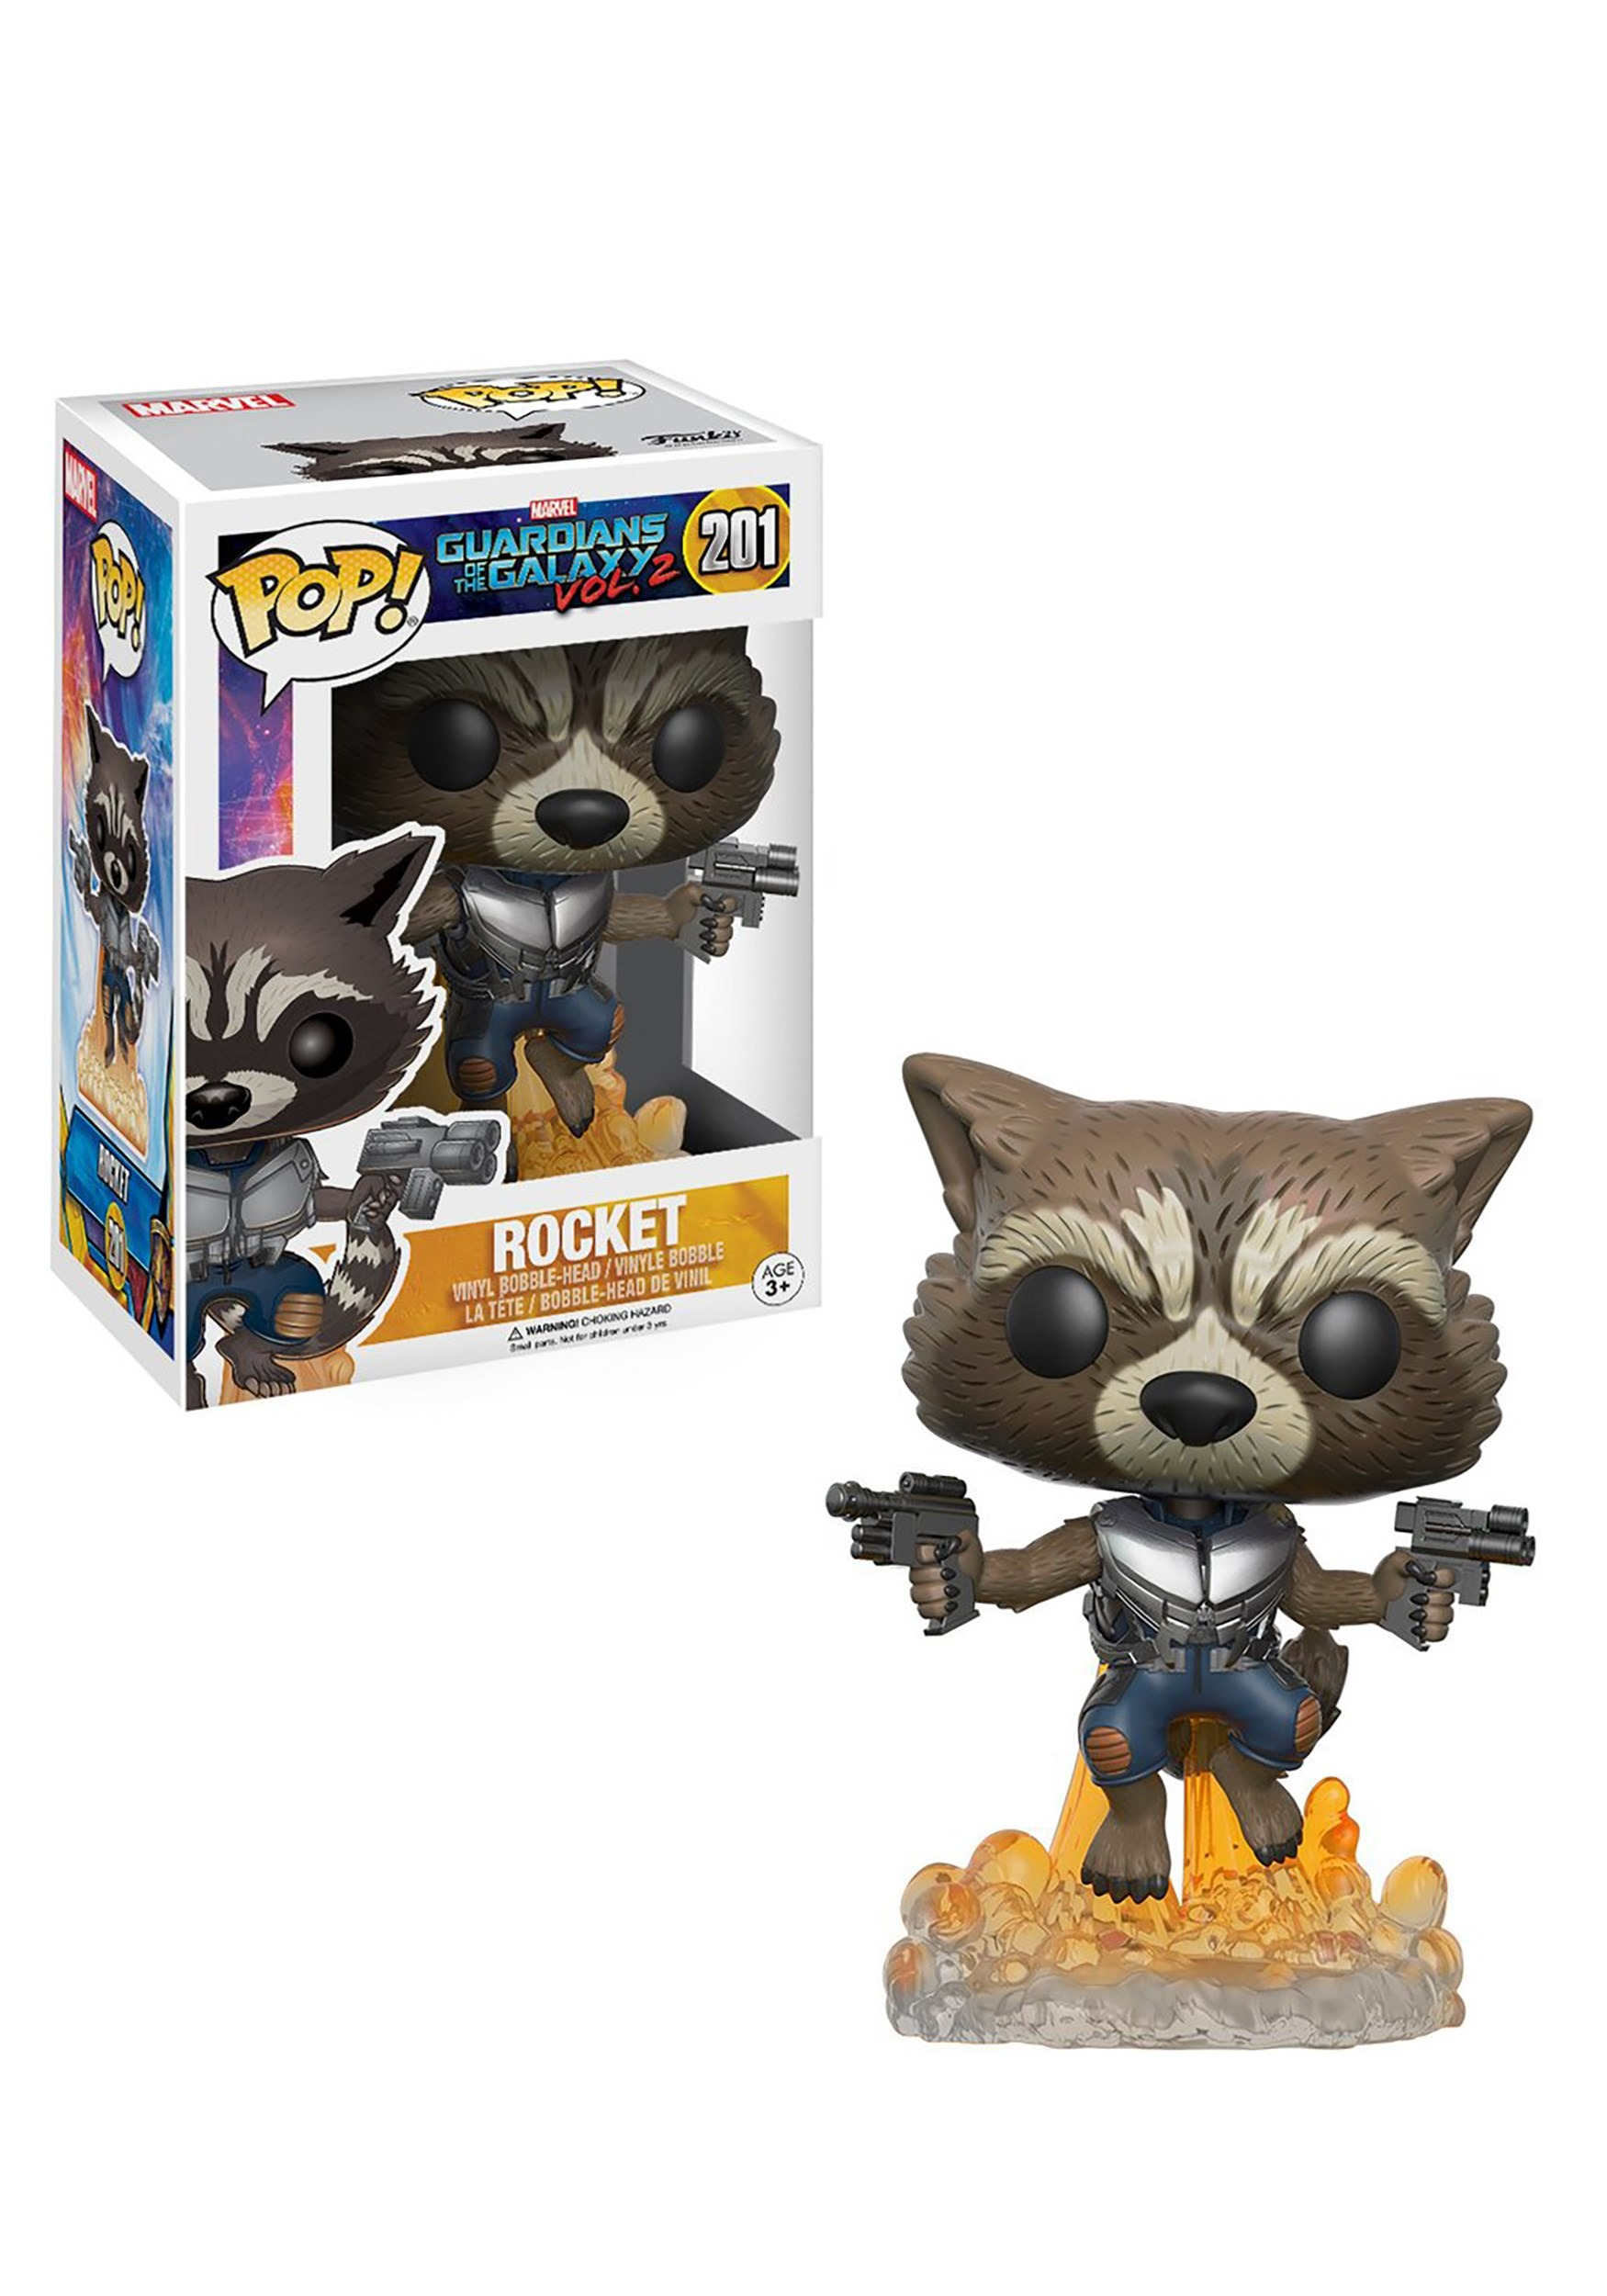 POP Guardians 2 Rocket Raccoon Bobblehead Figure FN13270